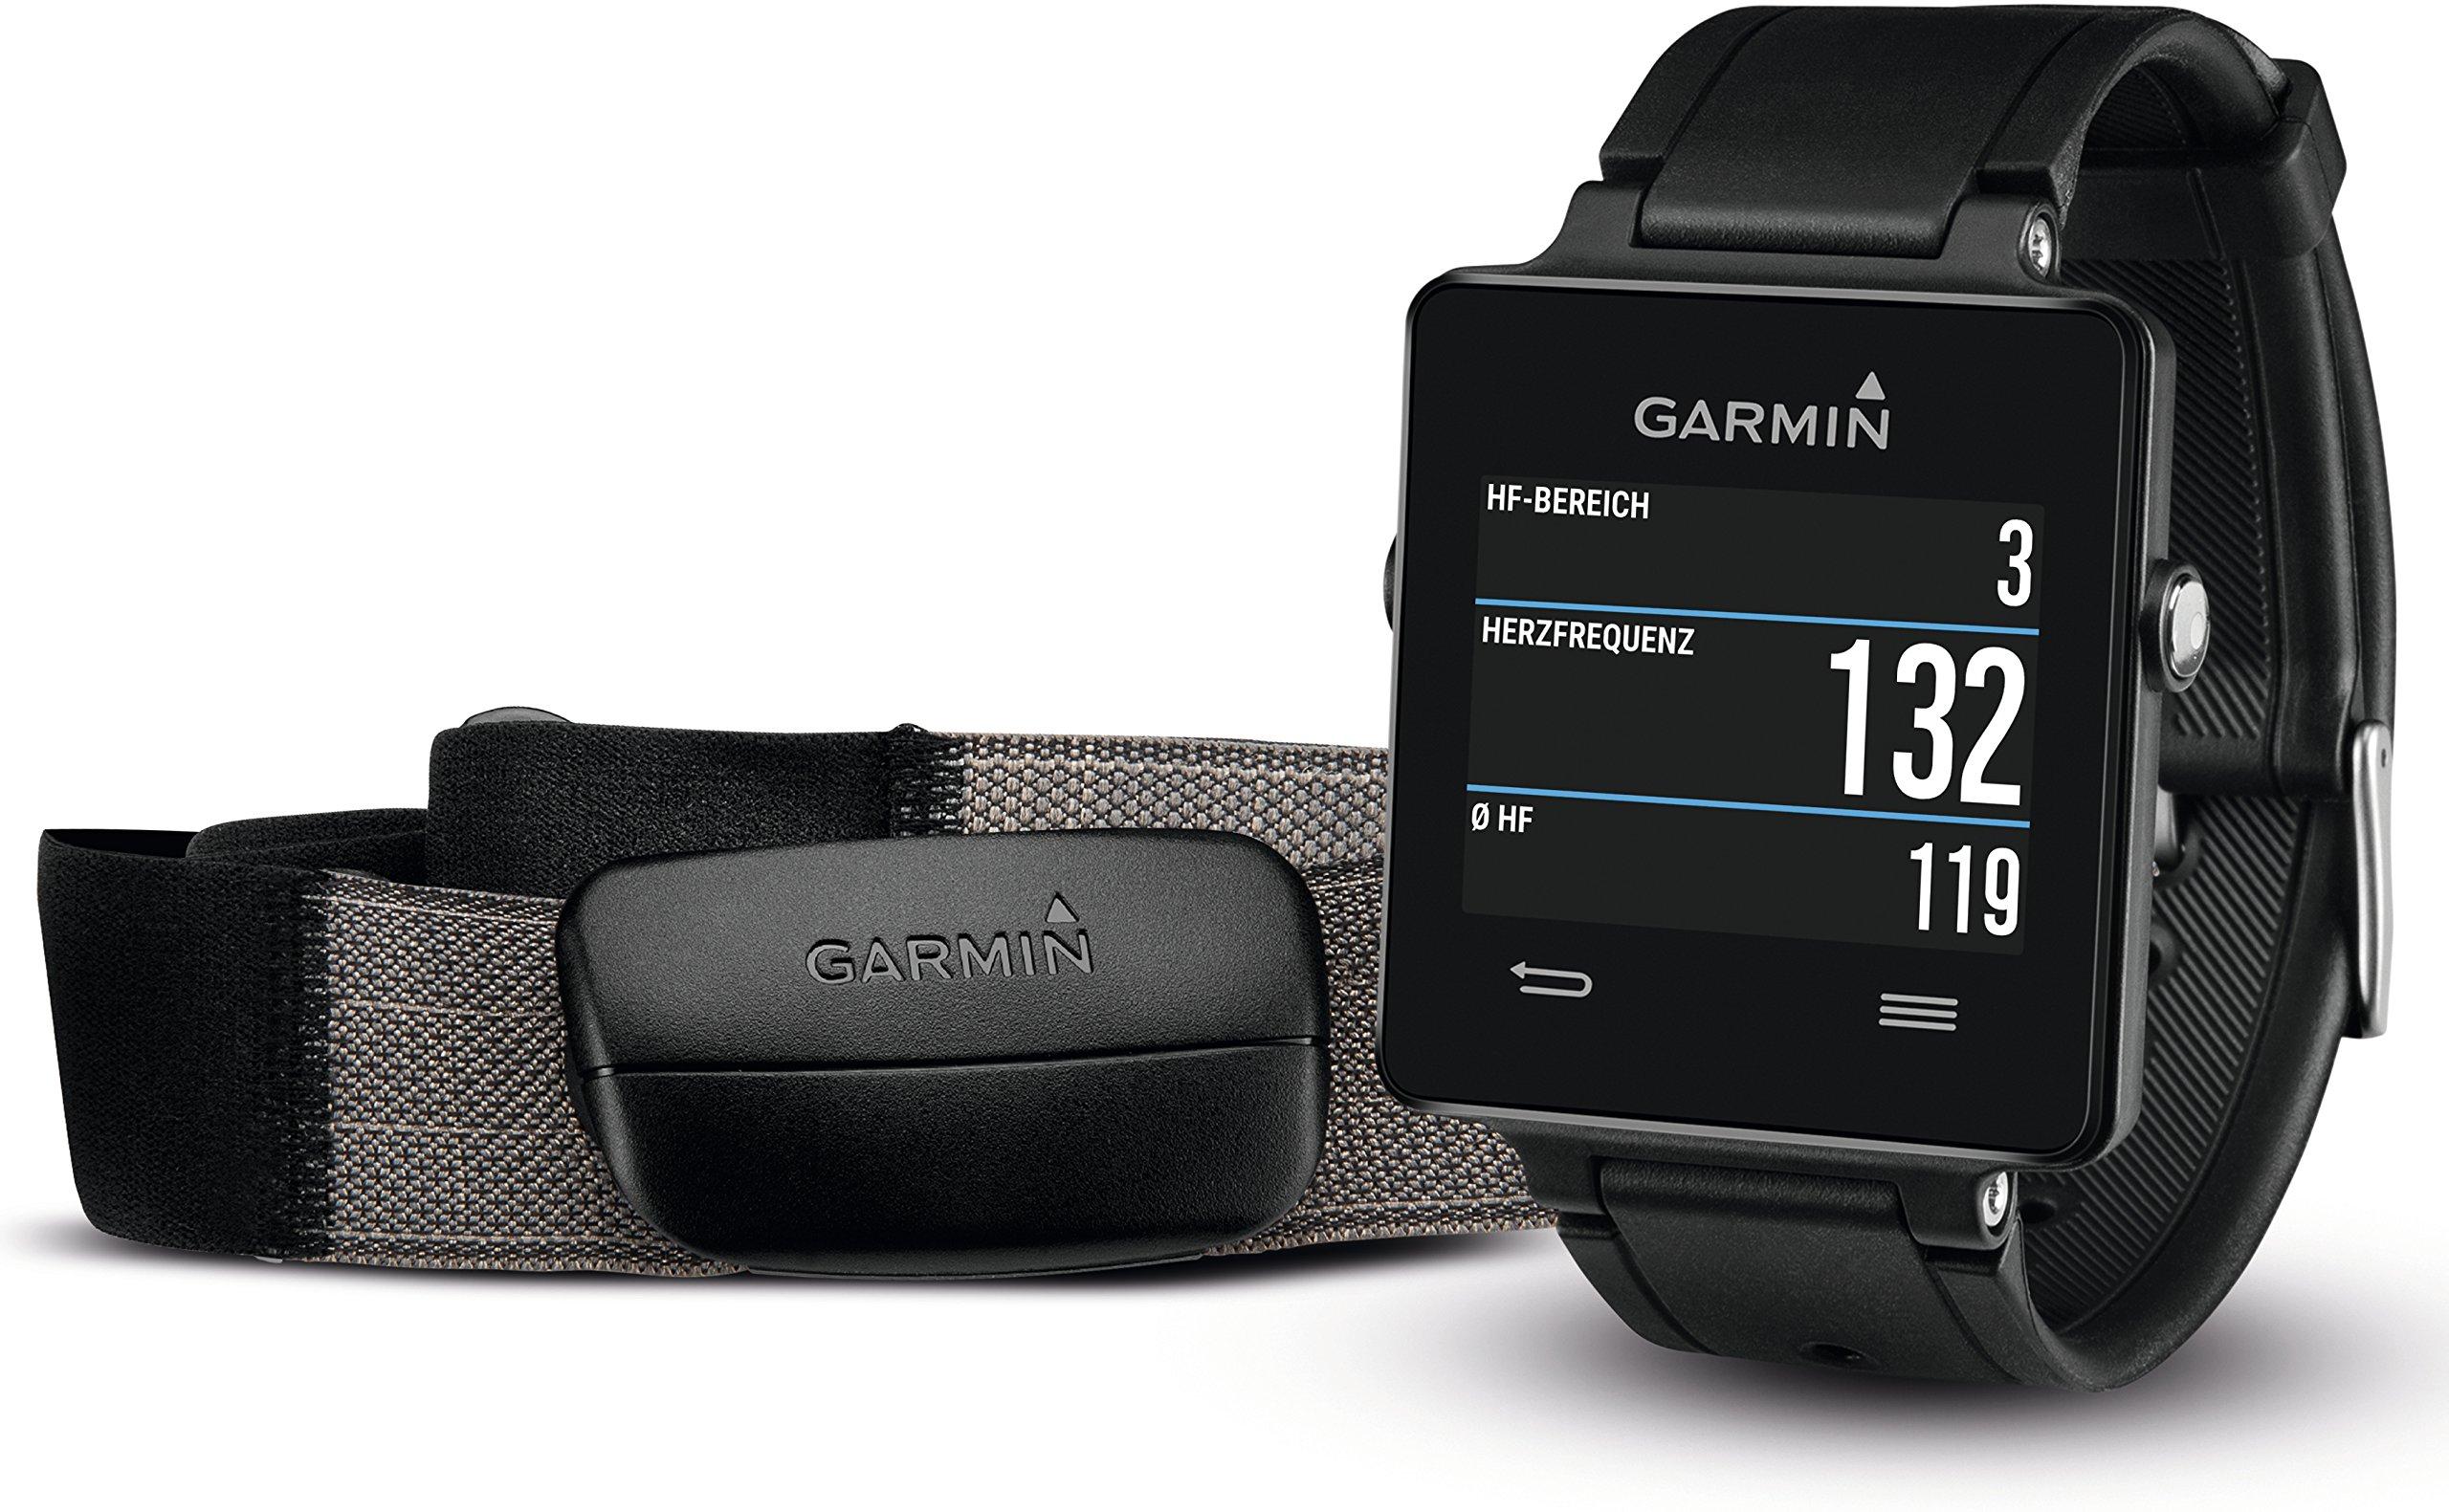 Garmin-Vivoactive-GPS-Smart-Watch-with-Heart-Rate-Monitor-Black